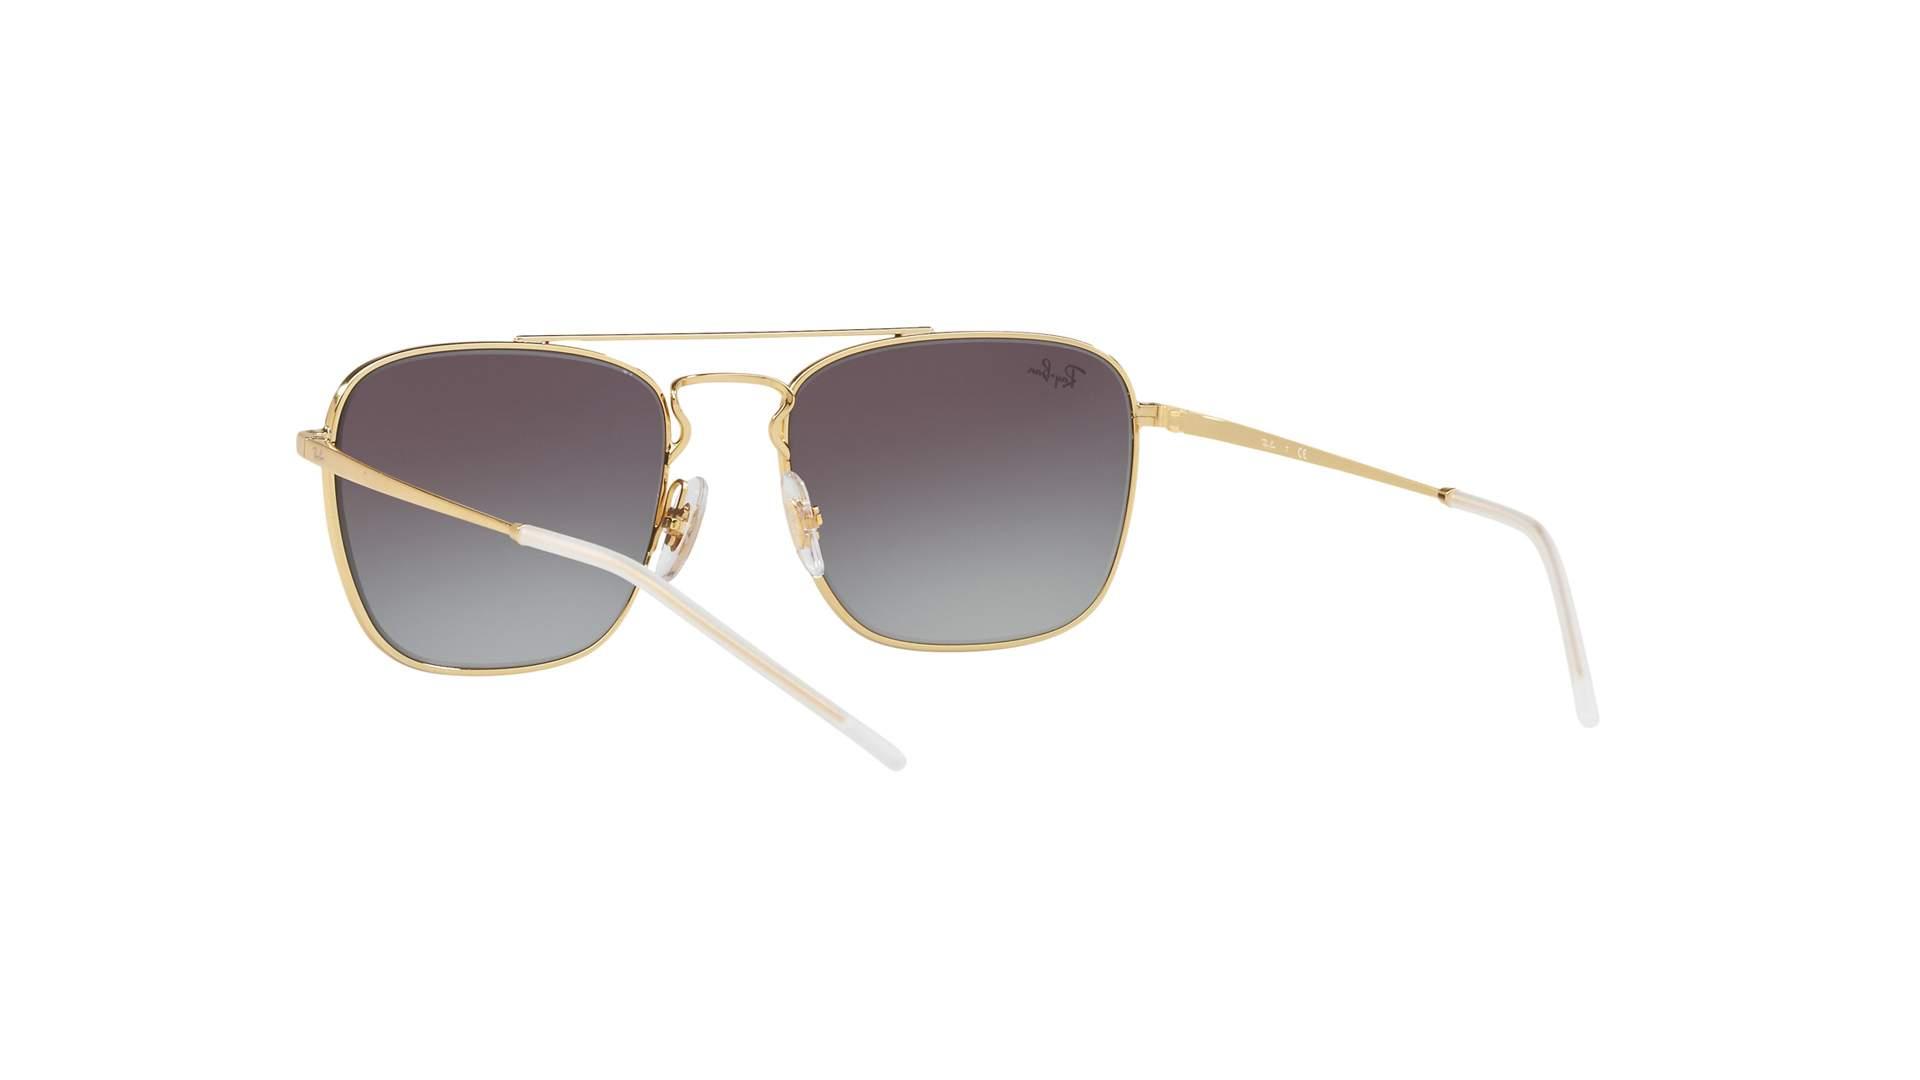 d4280f3497a Sunglasses Ray-Ban RB3588 9054 8G 55-19 Black Medium Gradient